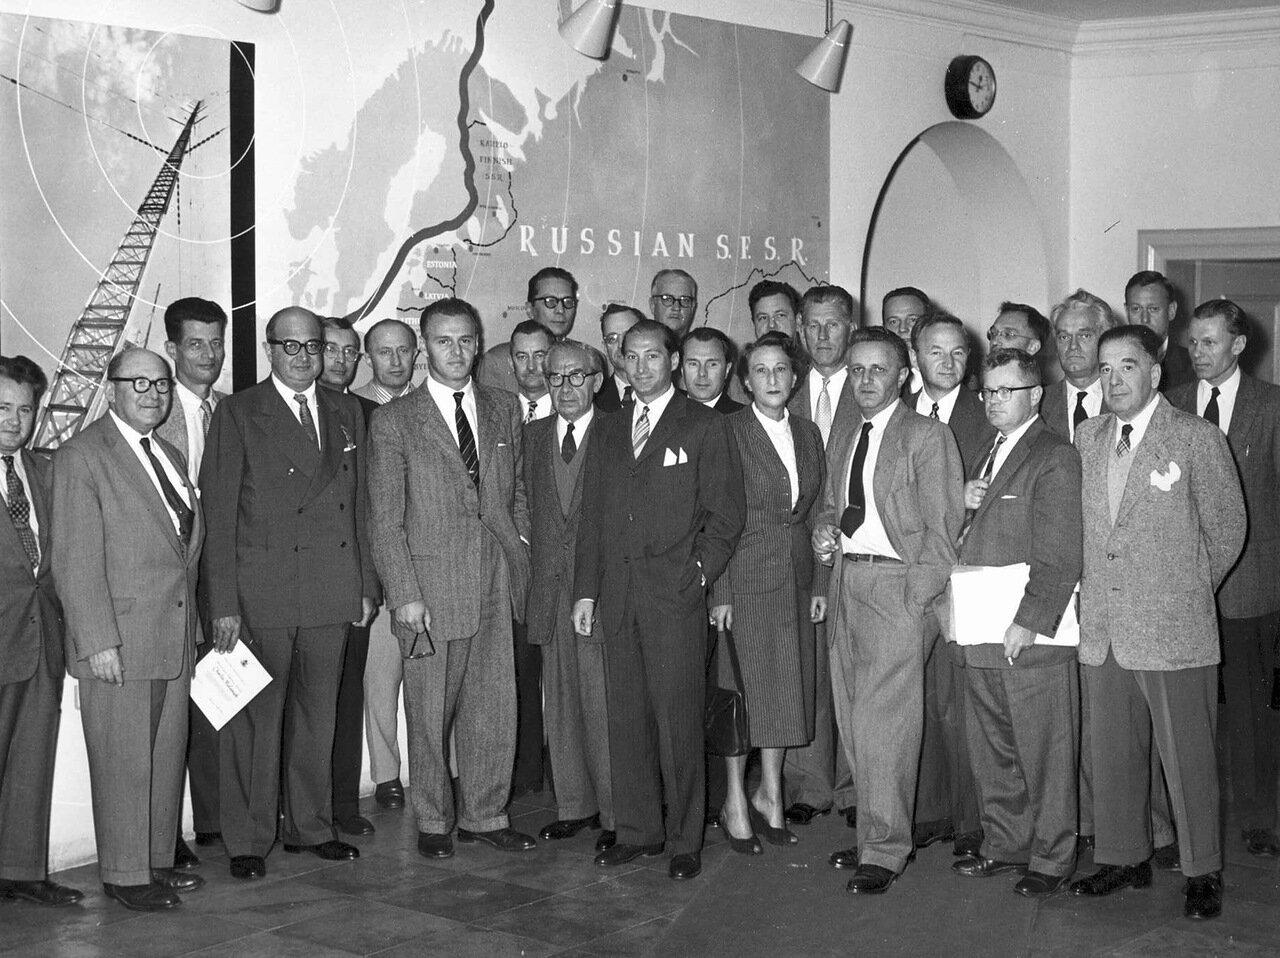 1955. Мюнхен, штаб-квартира Радио Свободная Европа